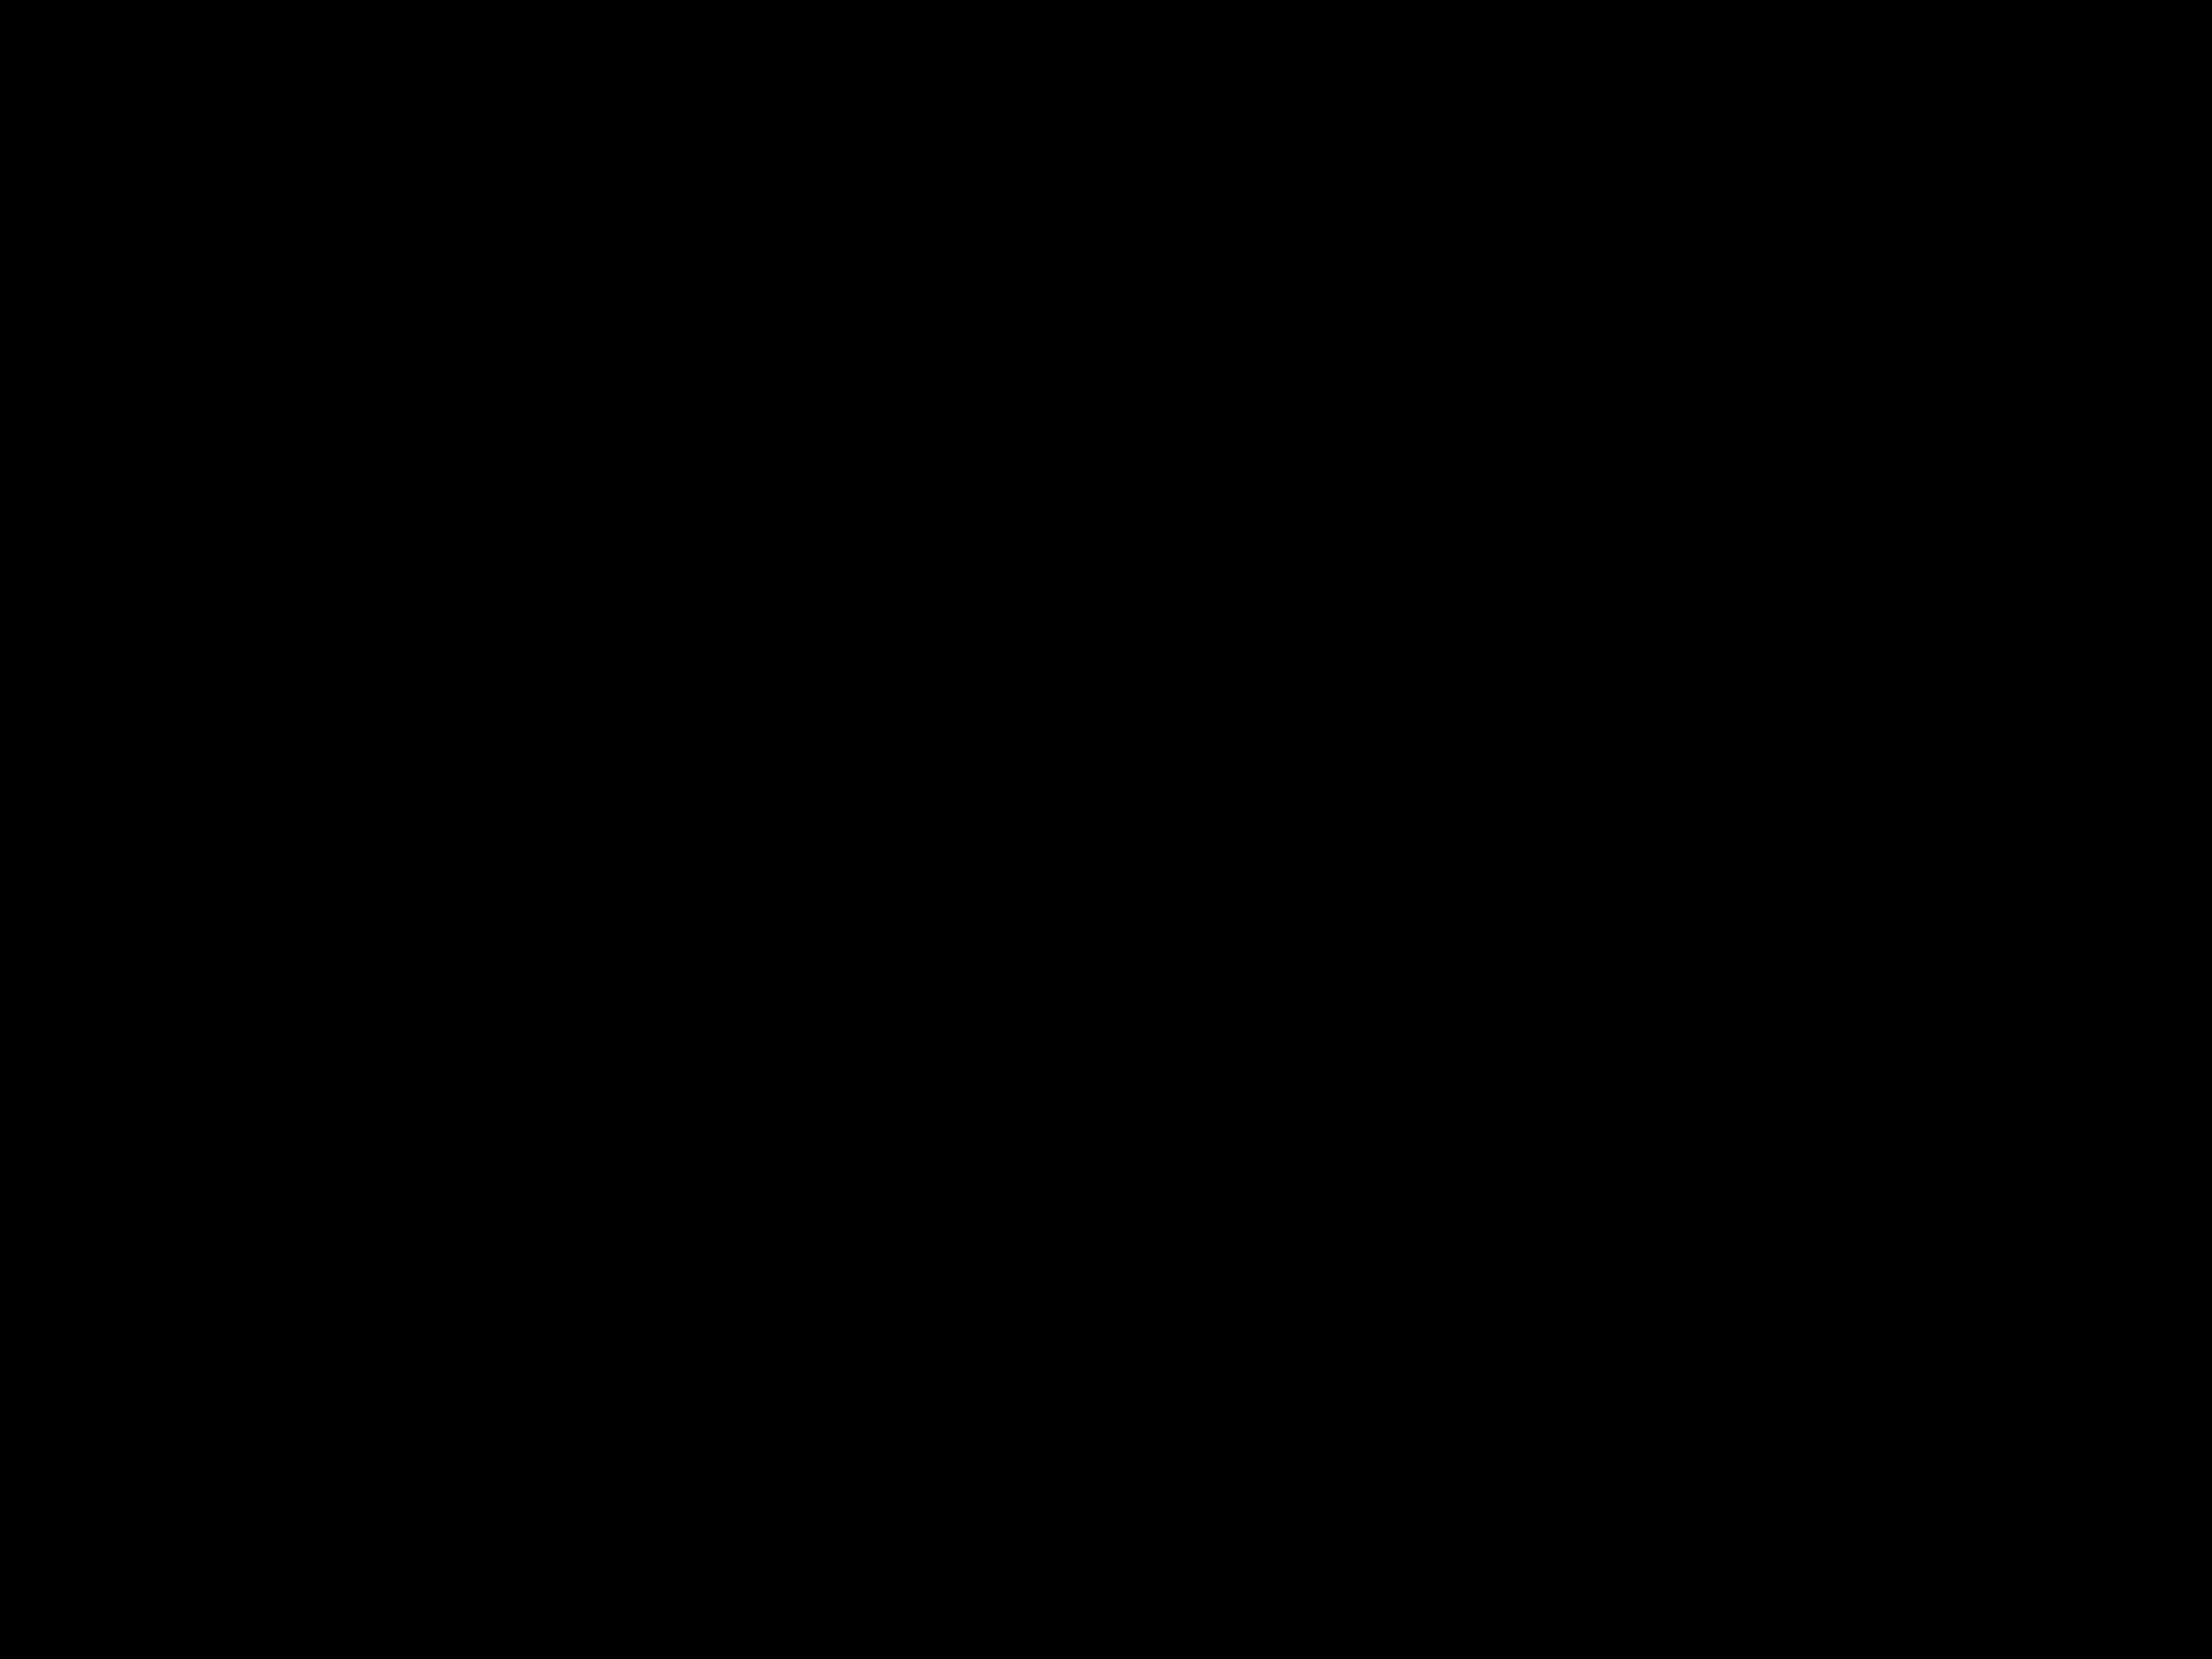 Ahtletikpokal 2019